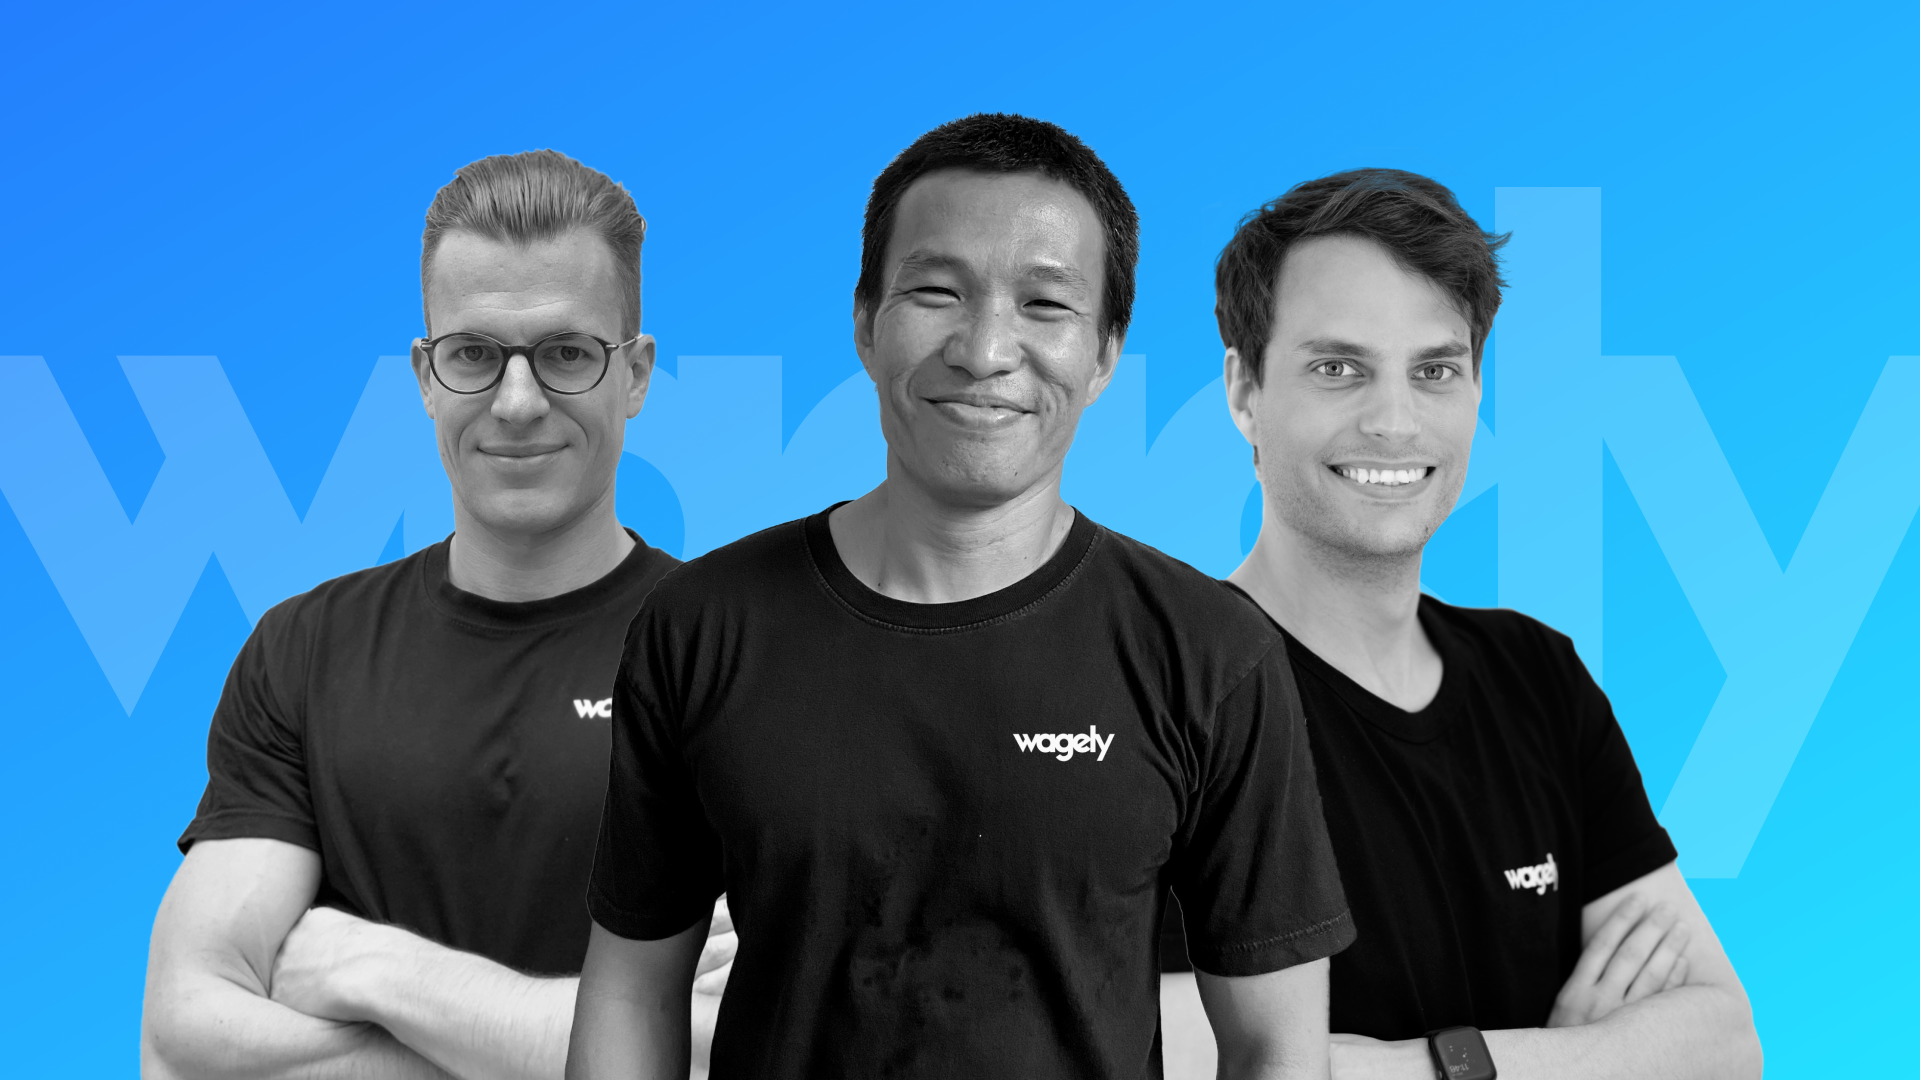 A group photo of Wagely's founding team: Tobias Fischer, Sasanadi Ruka and Kevin Hausburg